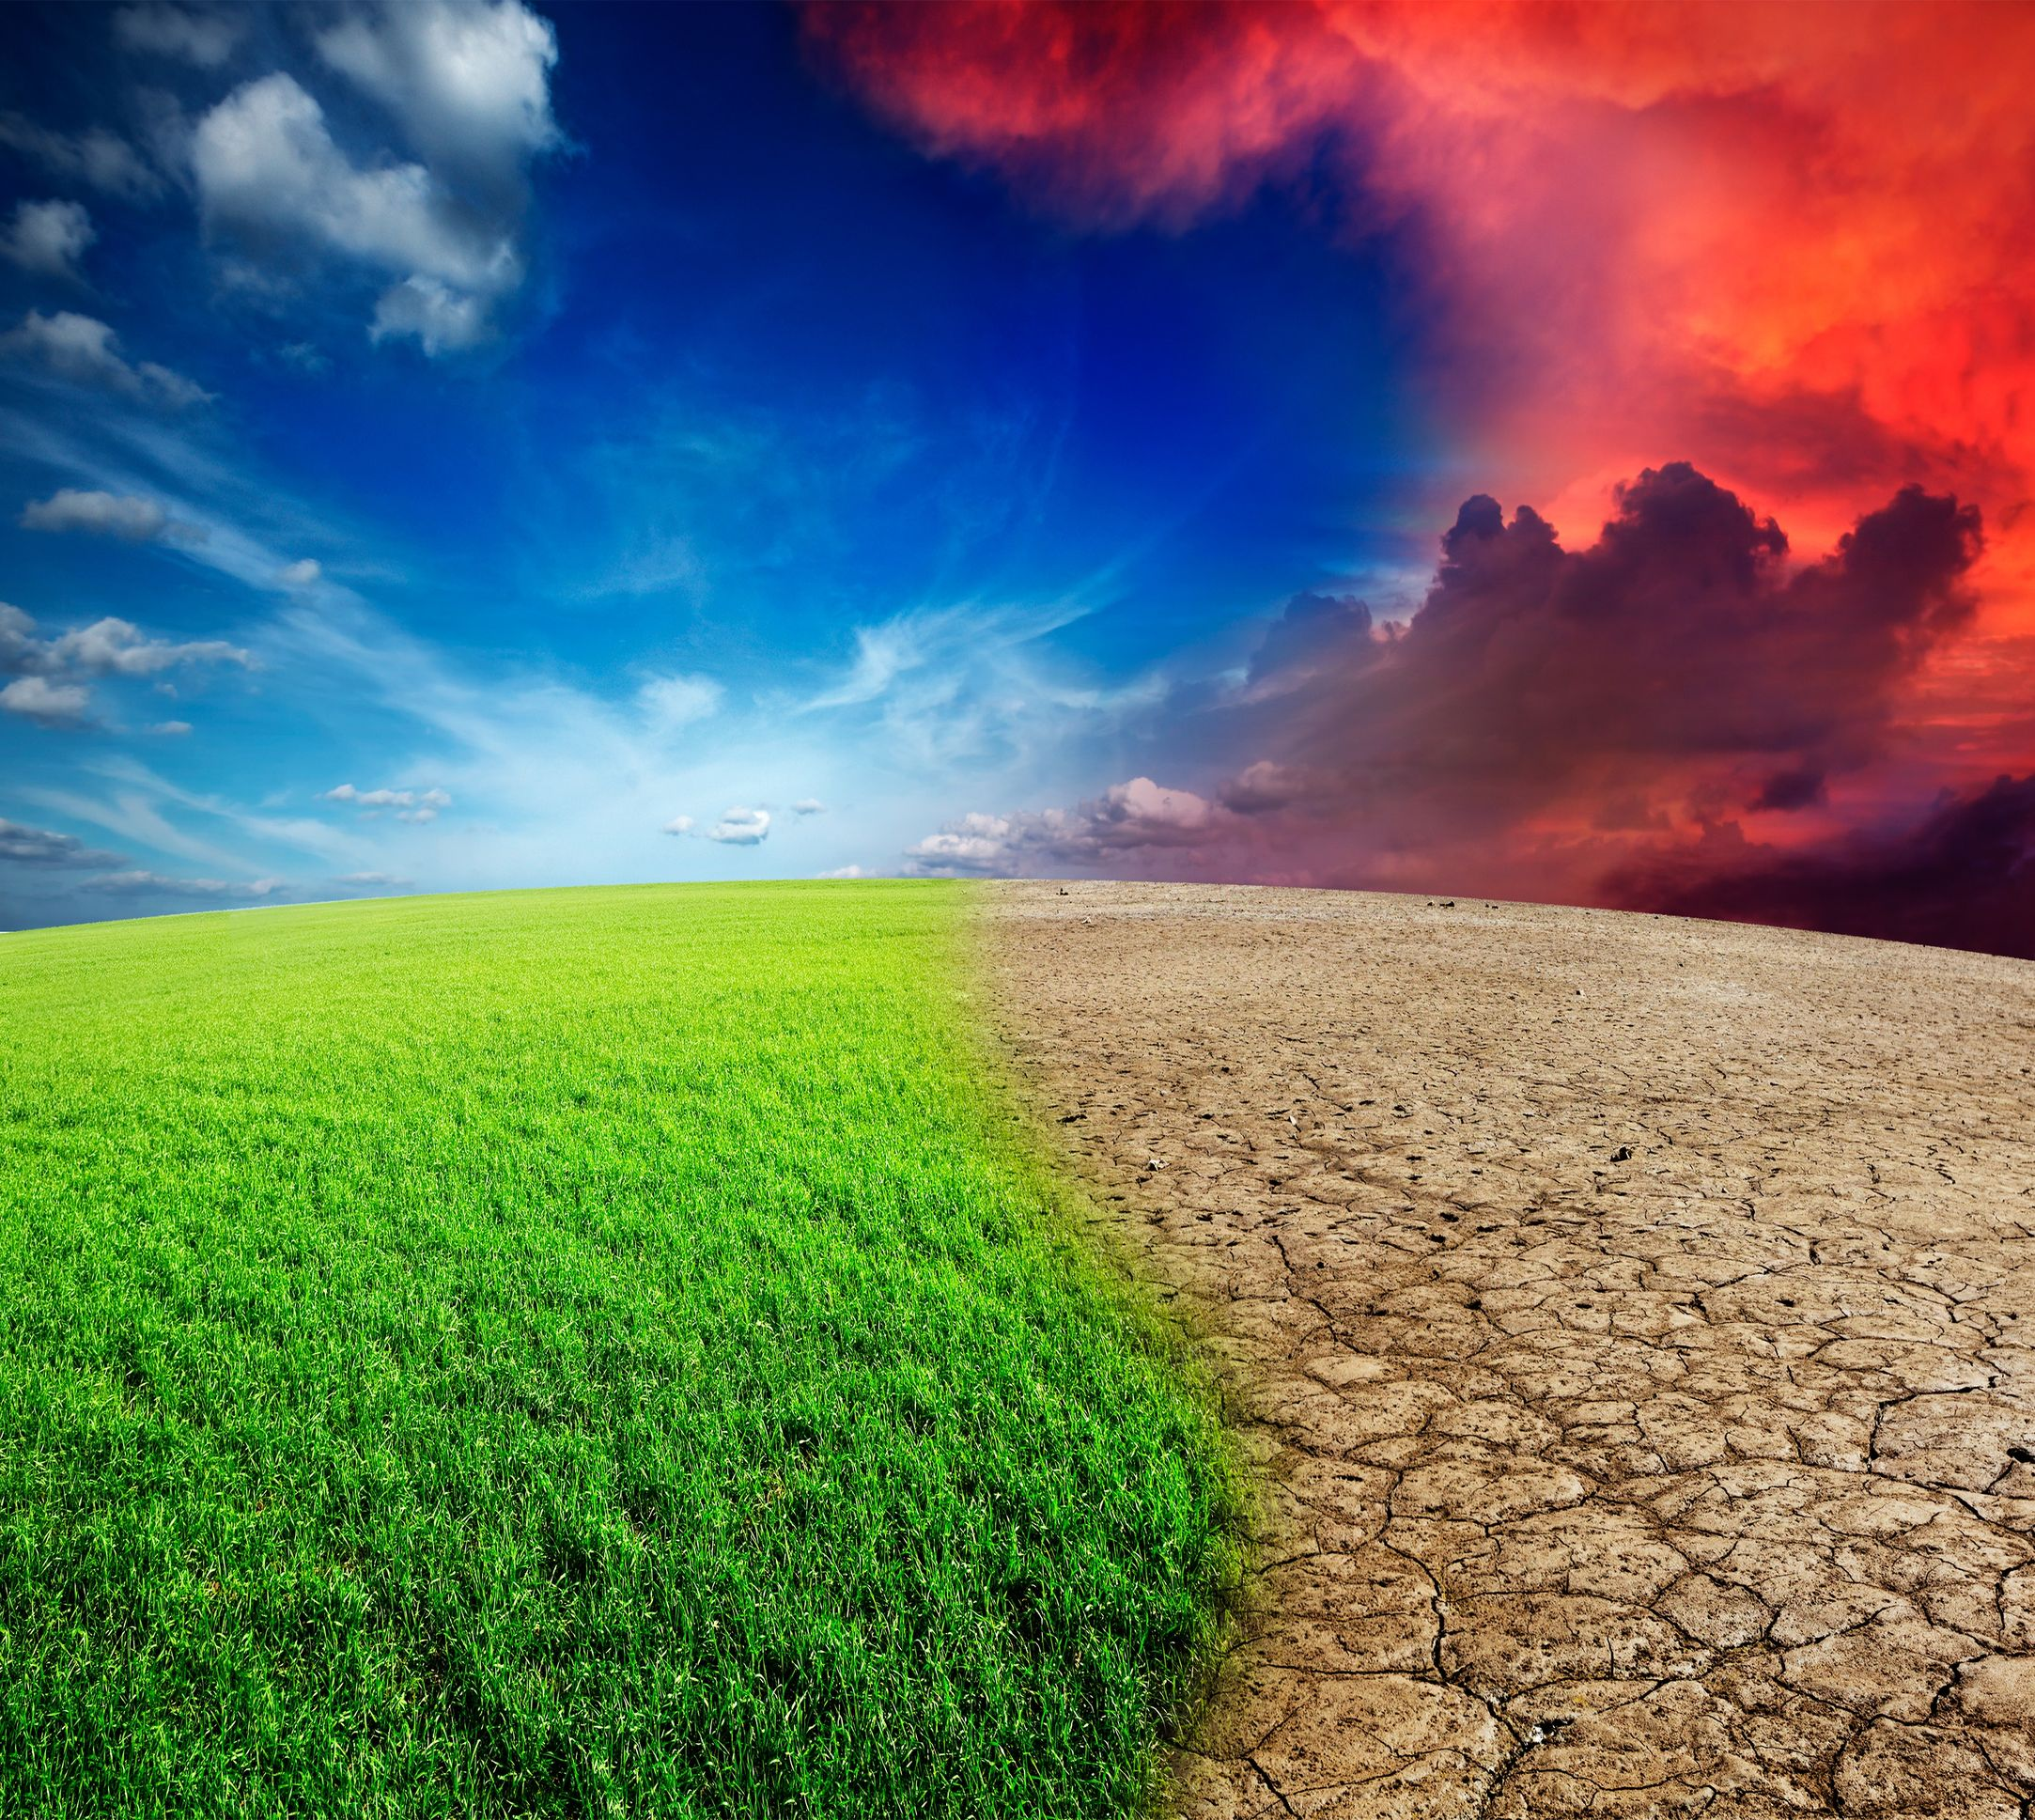 Climate change: a desert starts invading a lush green landscape.